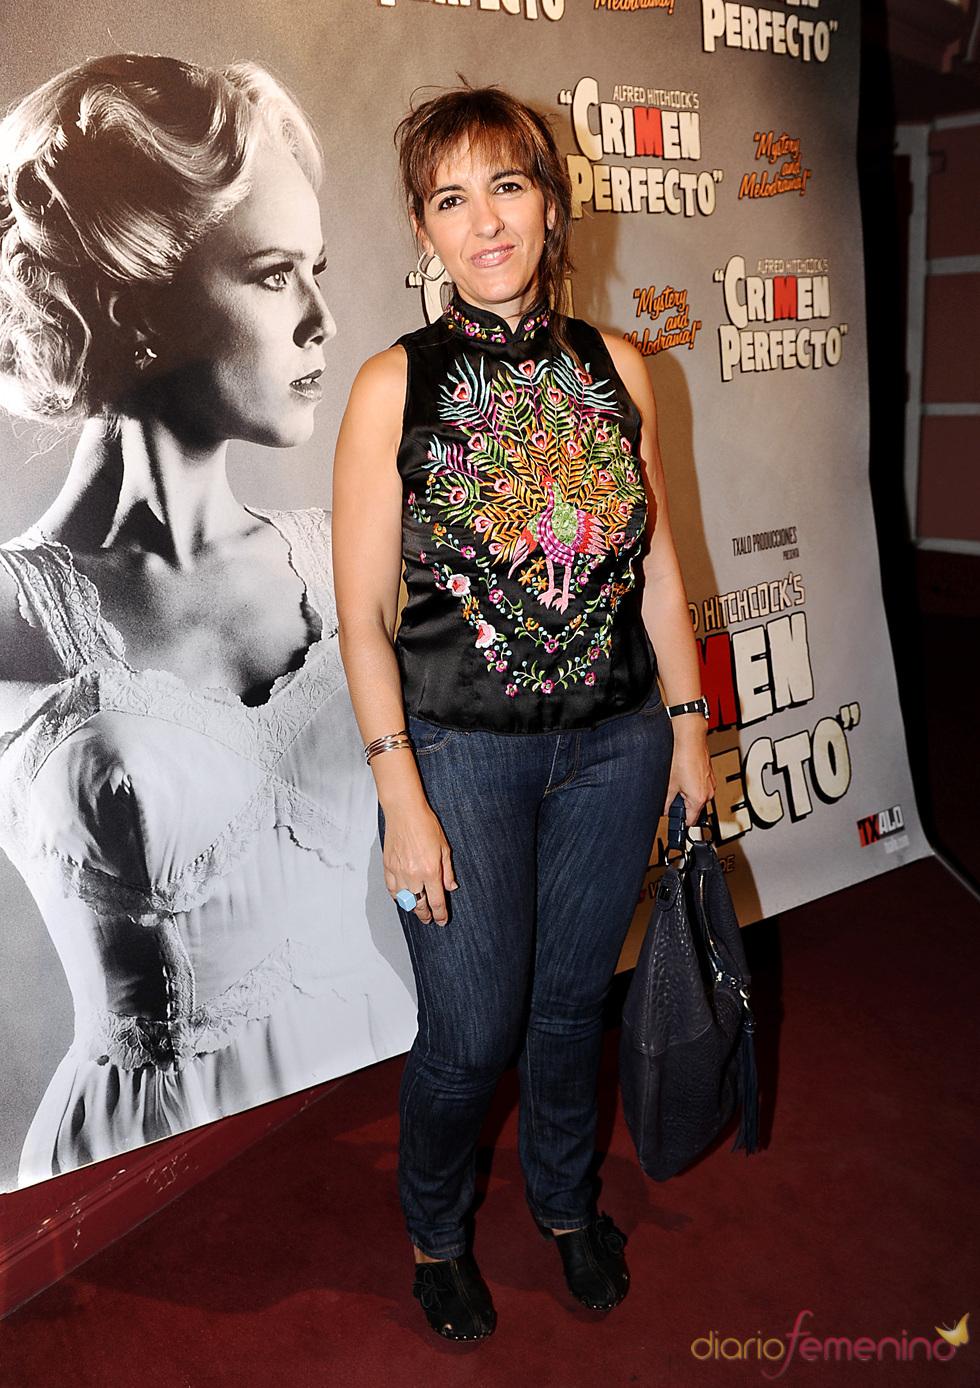 Llum Barrera en el estreno de 'Crimen perfecto' en Madrid